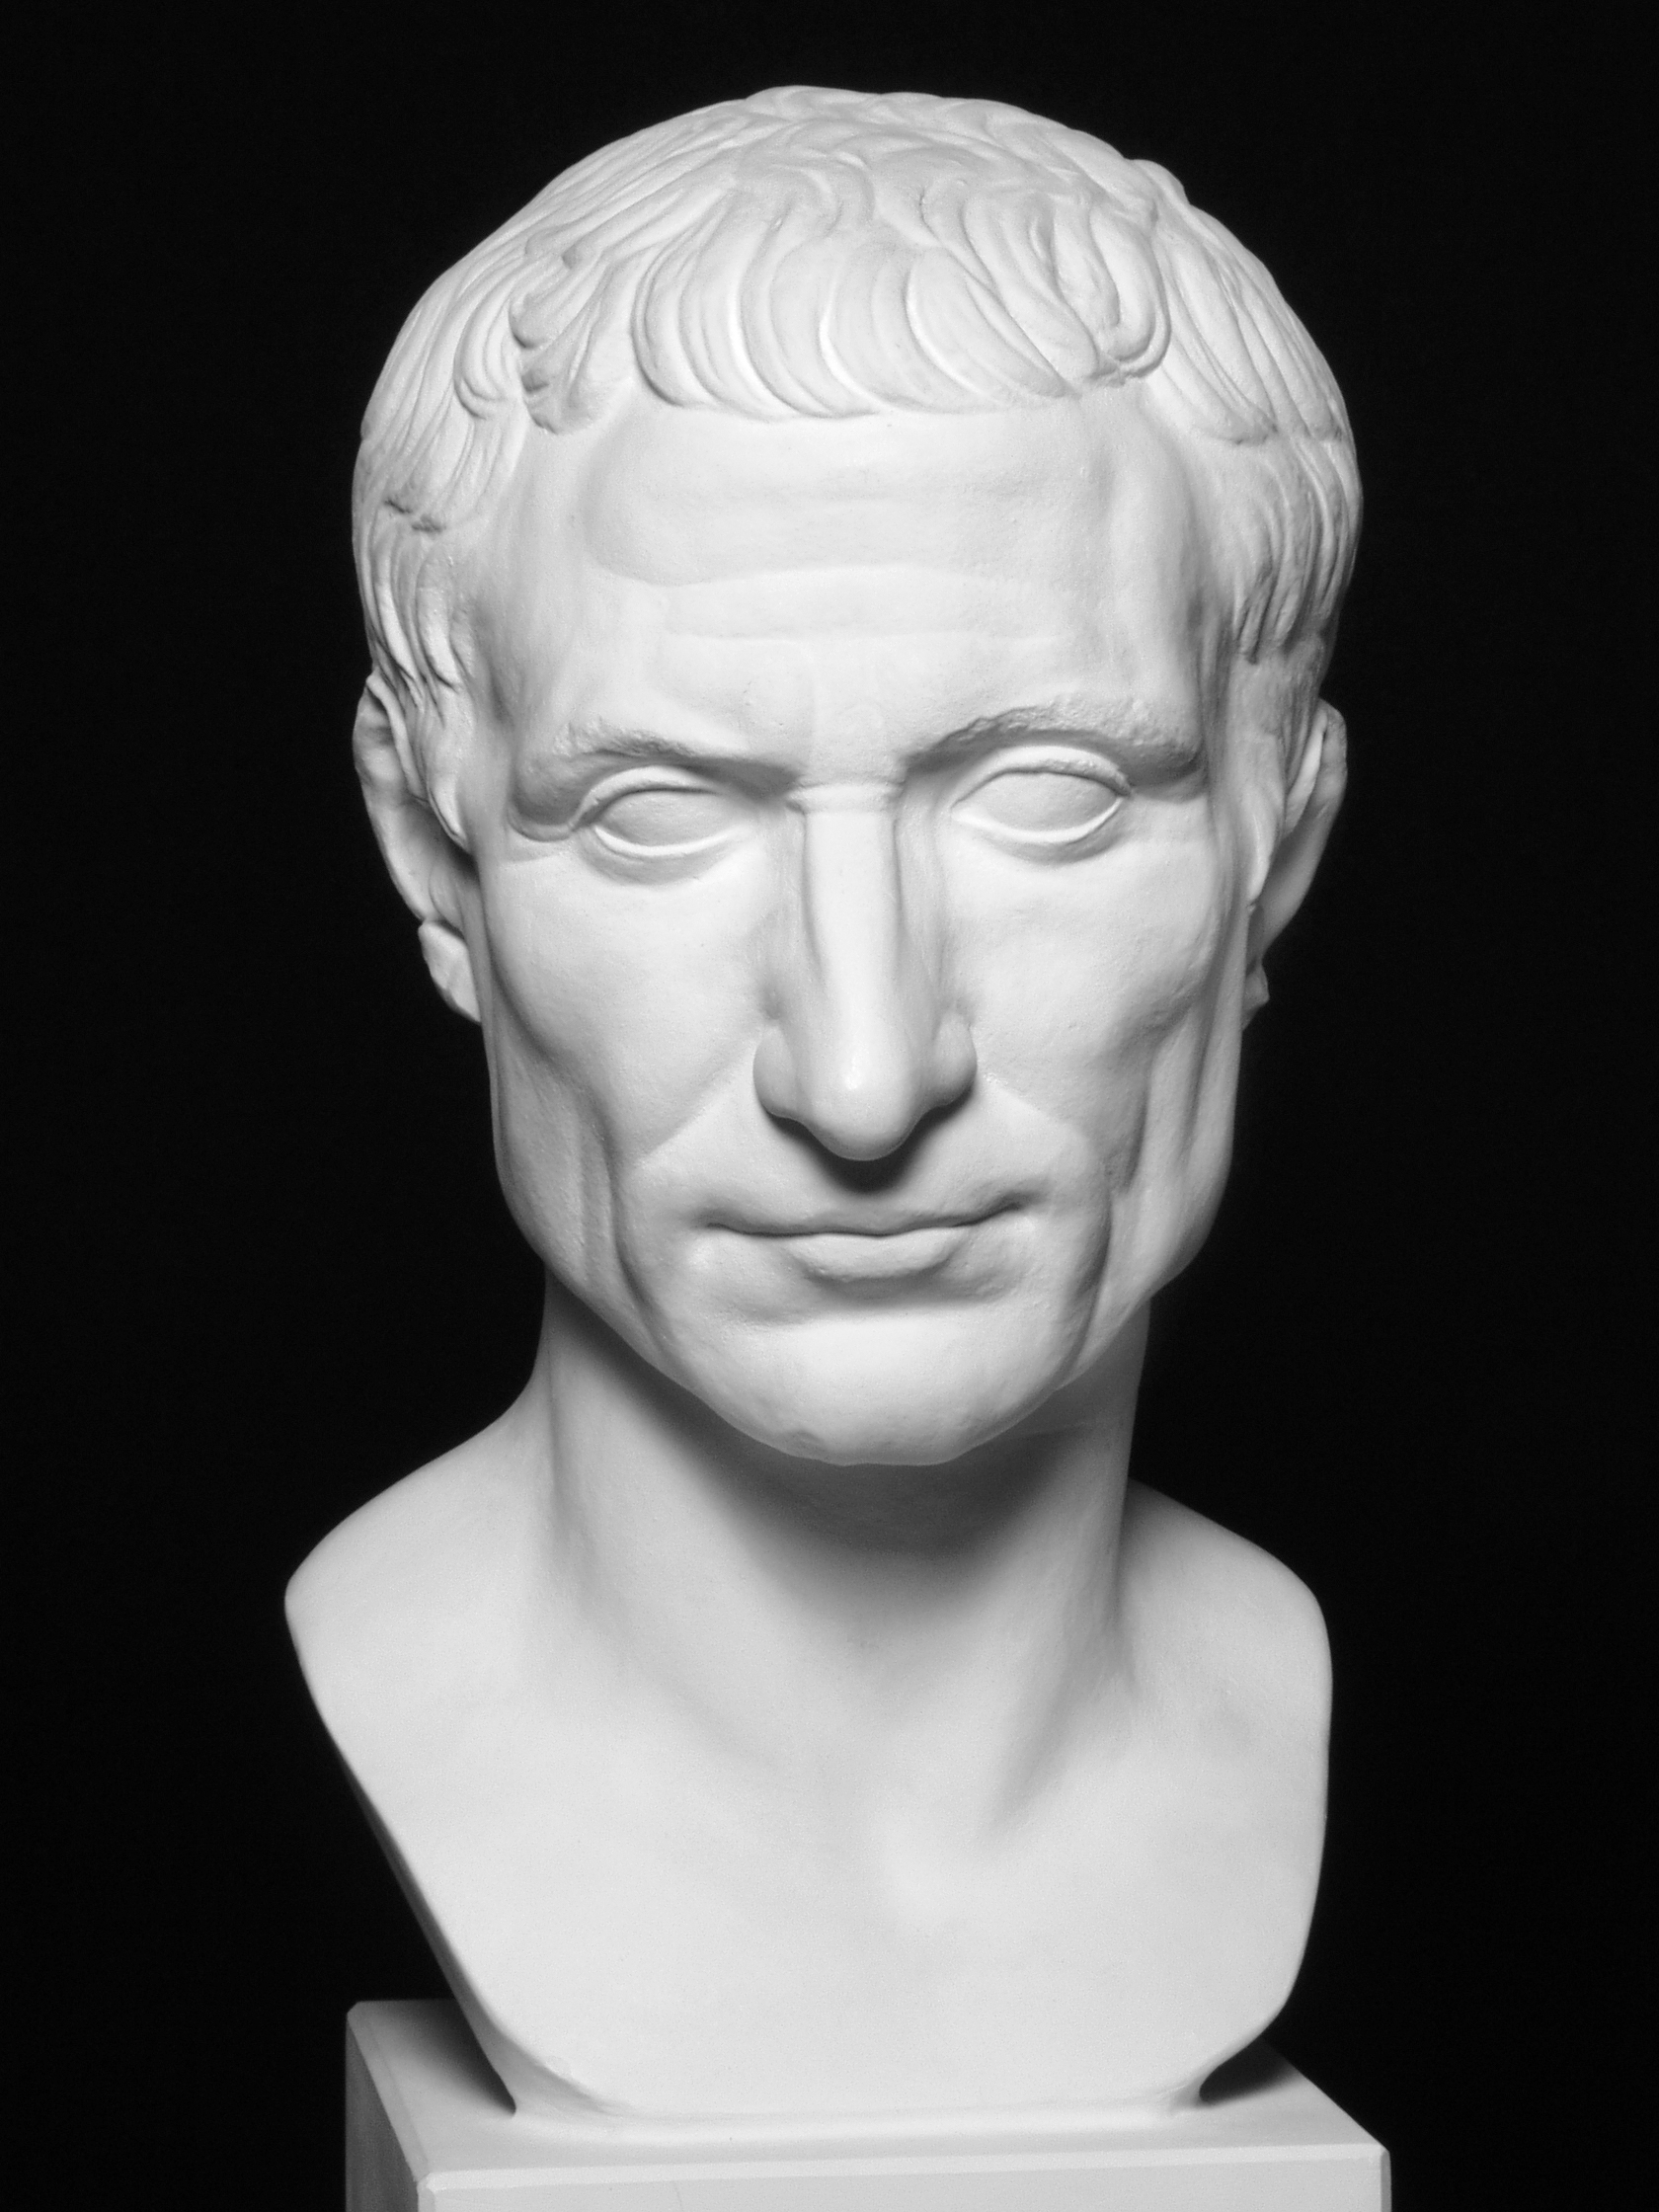 guter, schlechter, lei... Octavius Julius Caesar